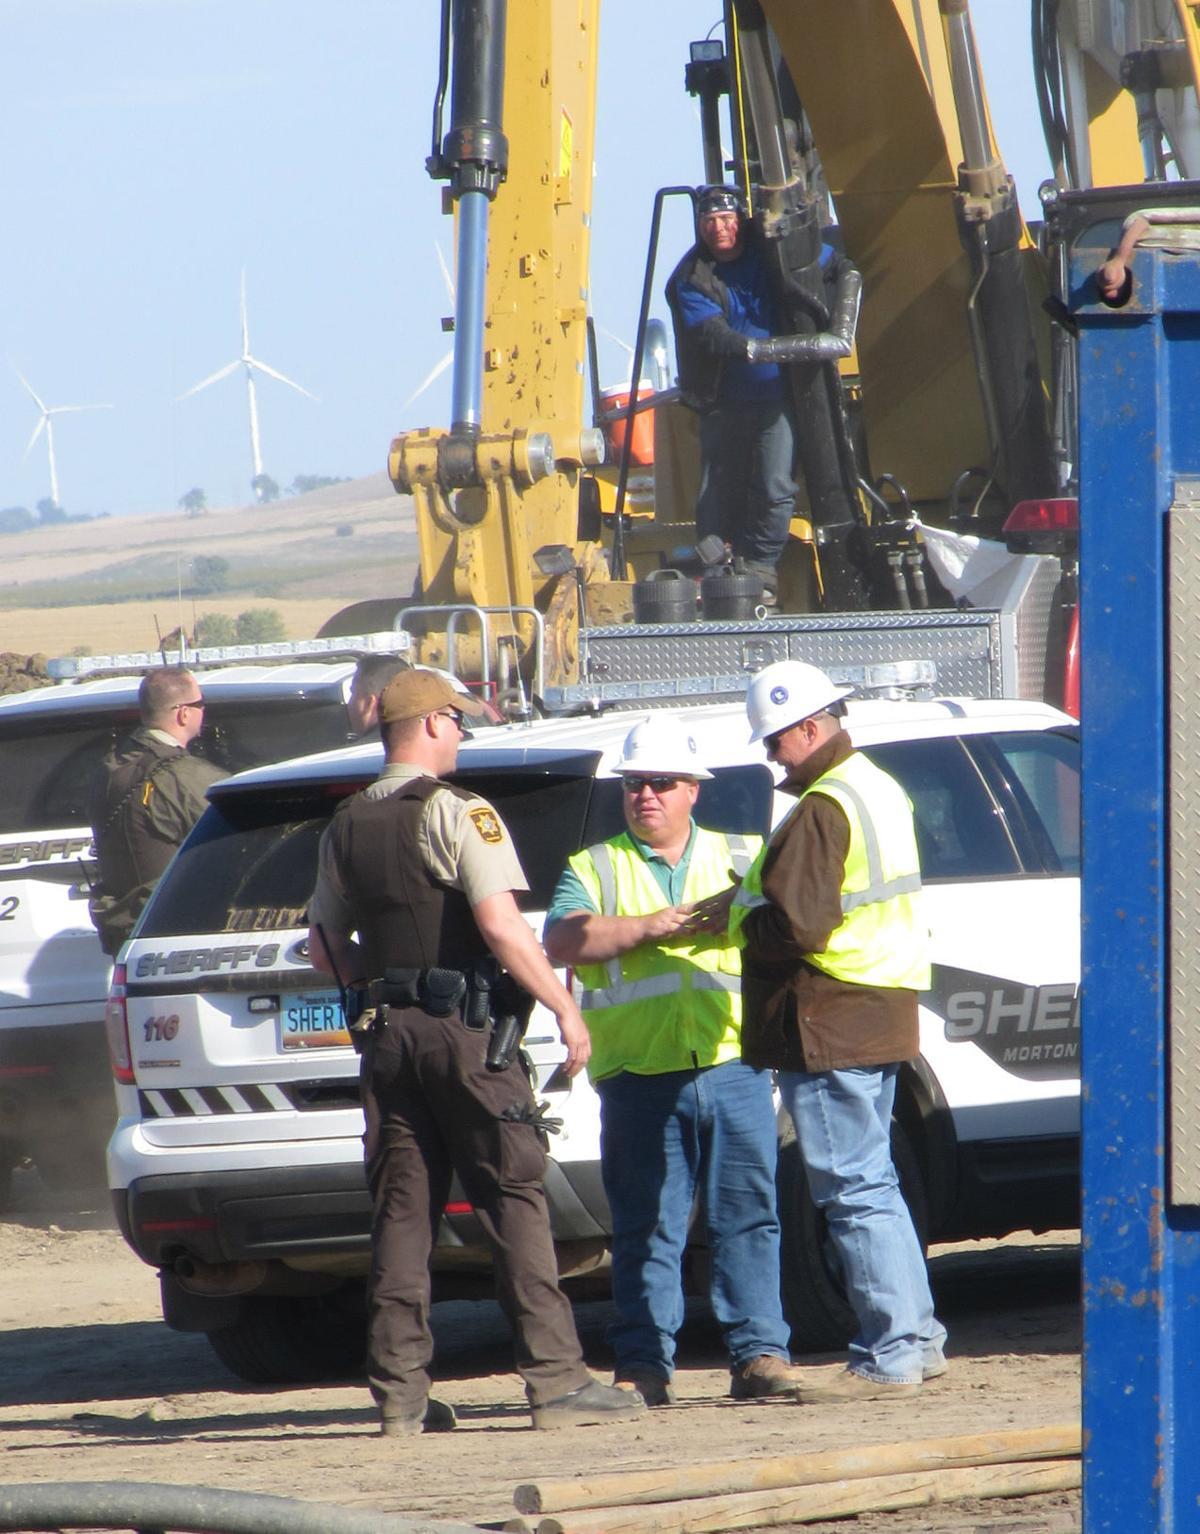 North dakota morton county glen ullin - Dakota Access Protest